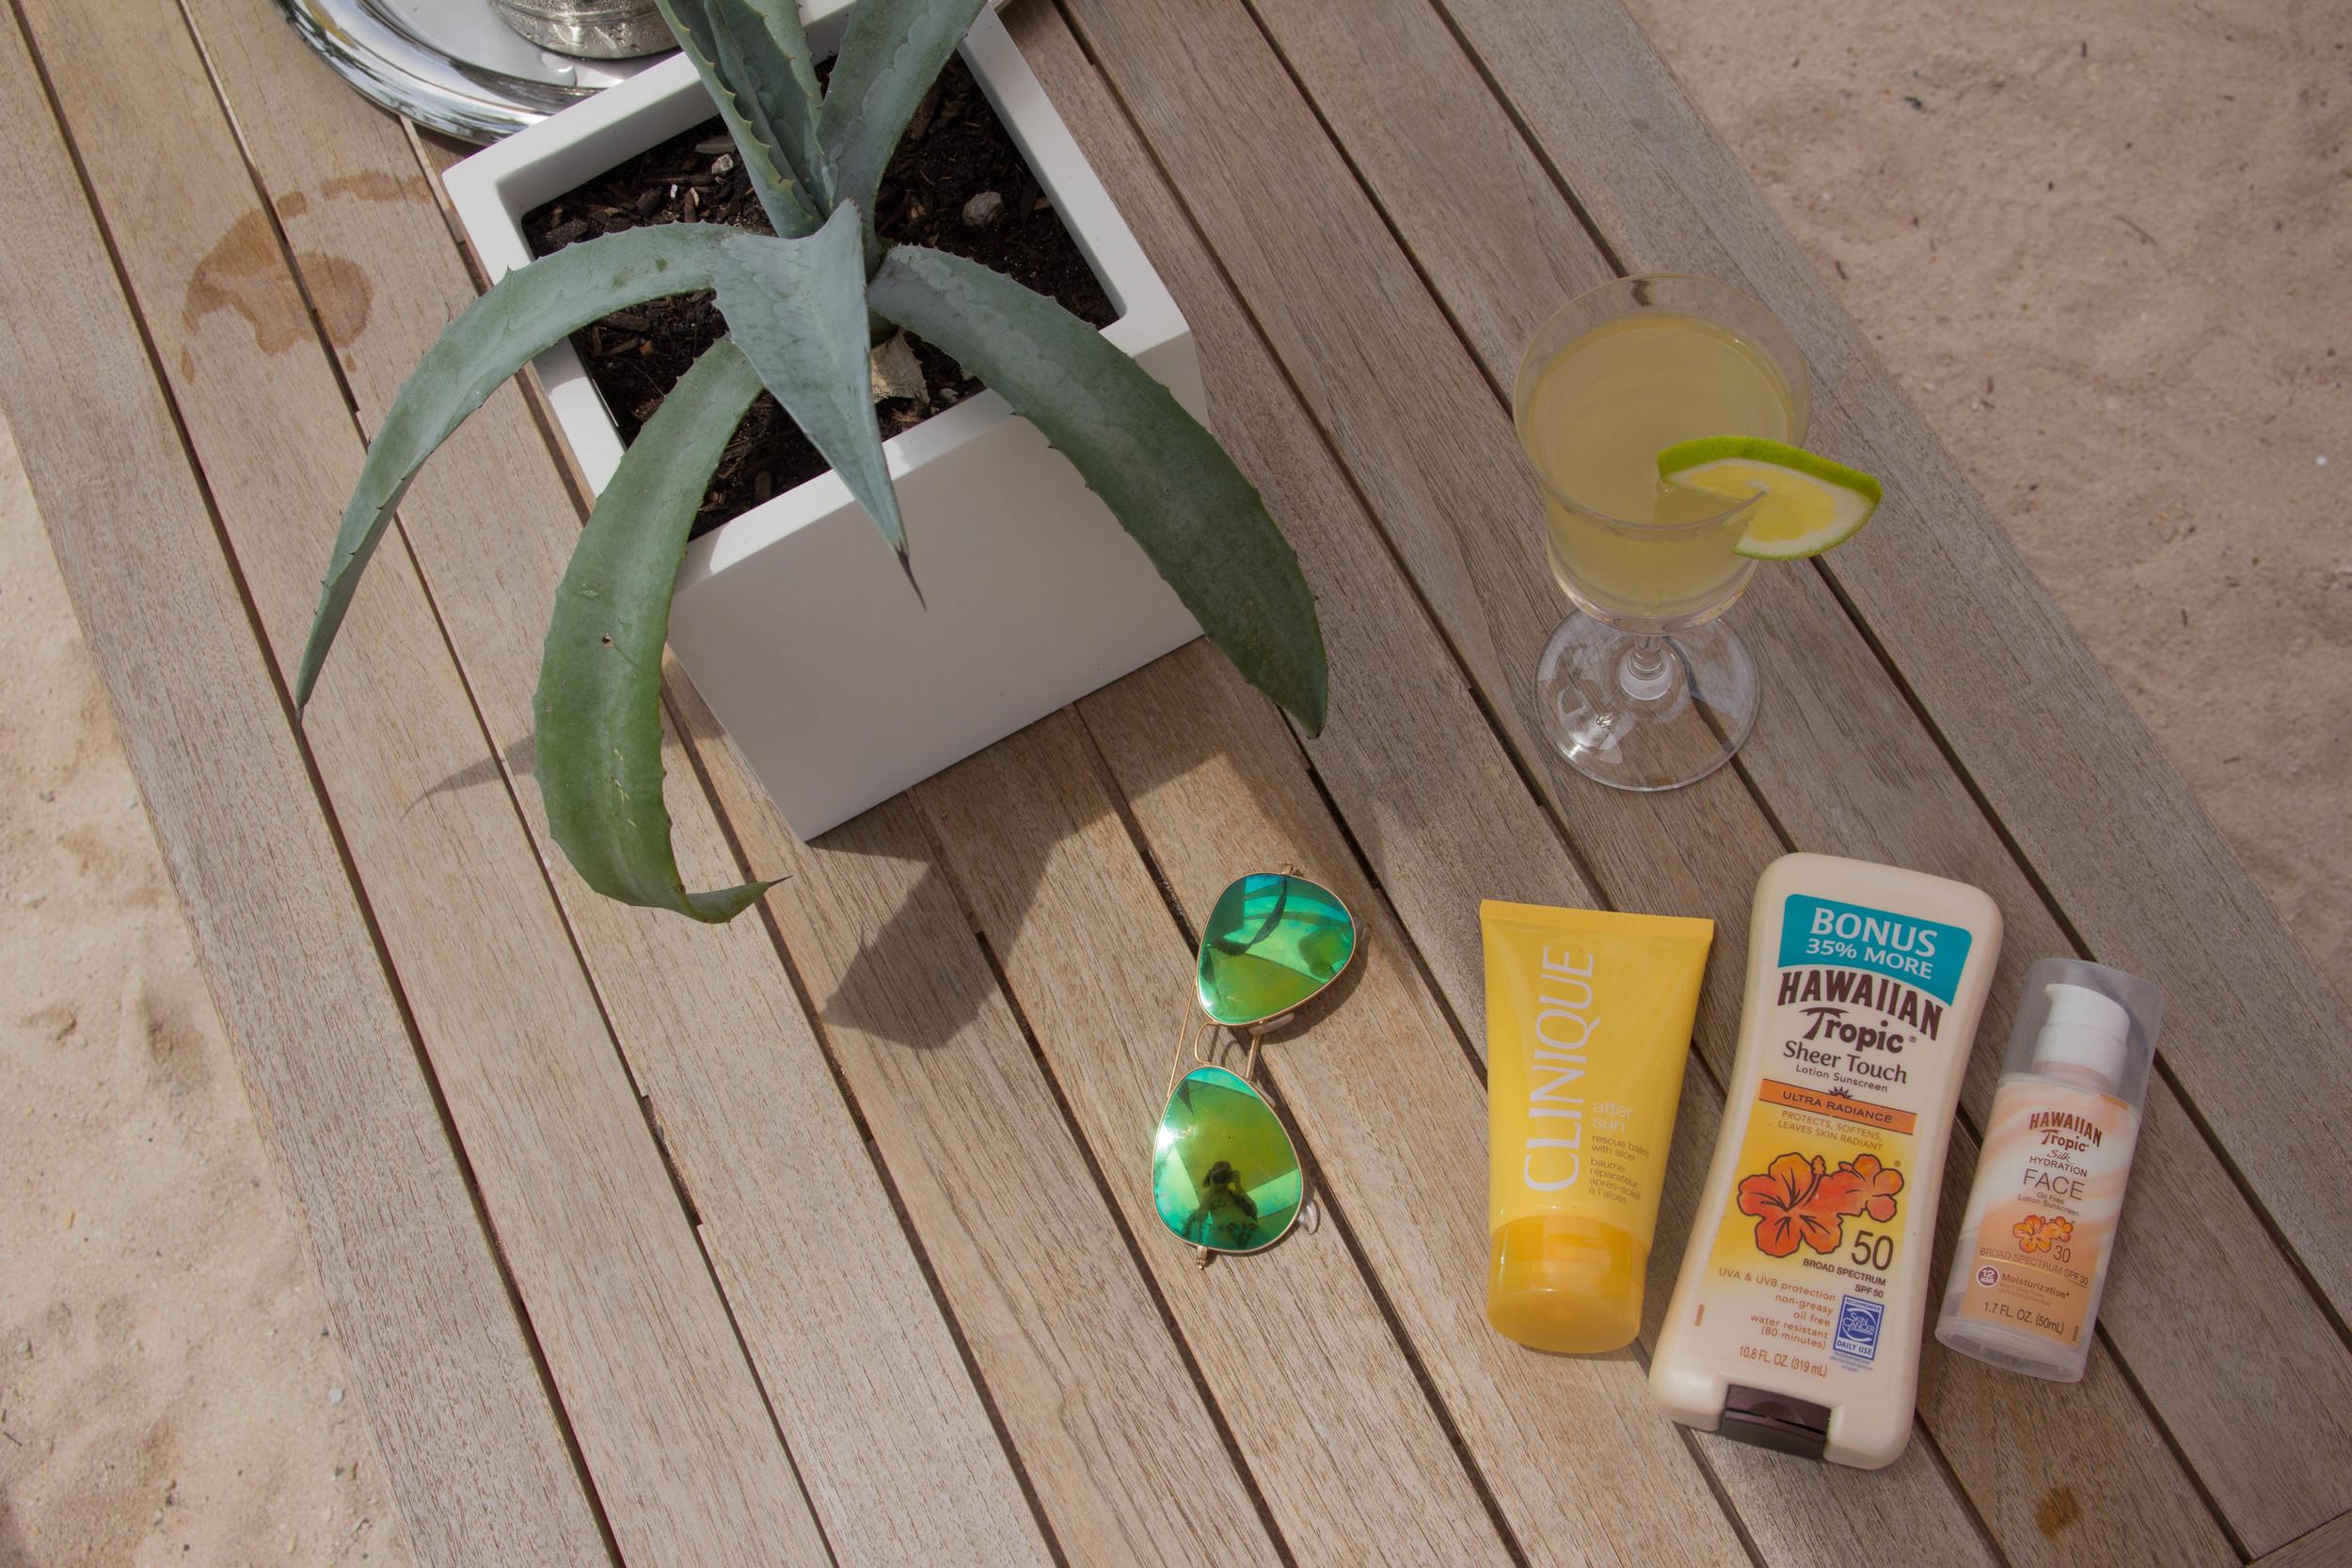 le soleil d'or, cayman brac, grand cayman islands, caribbean islands, vacation, farm, fresh, organic, mimosas, beach, bcbg panama hat, all for color pineapple bikini, rayban mirrored aviators